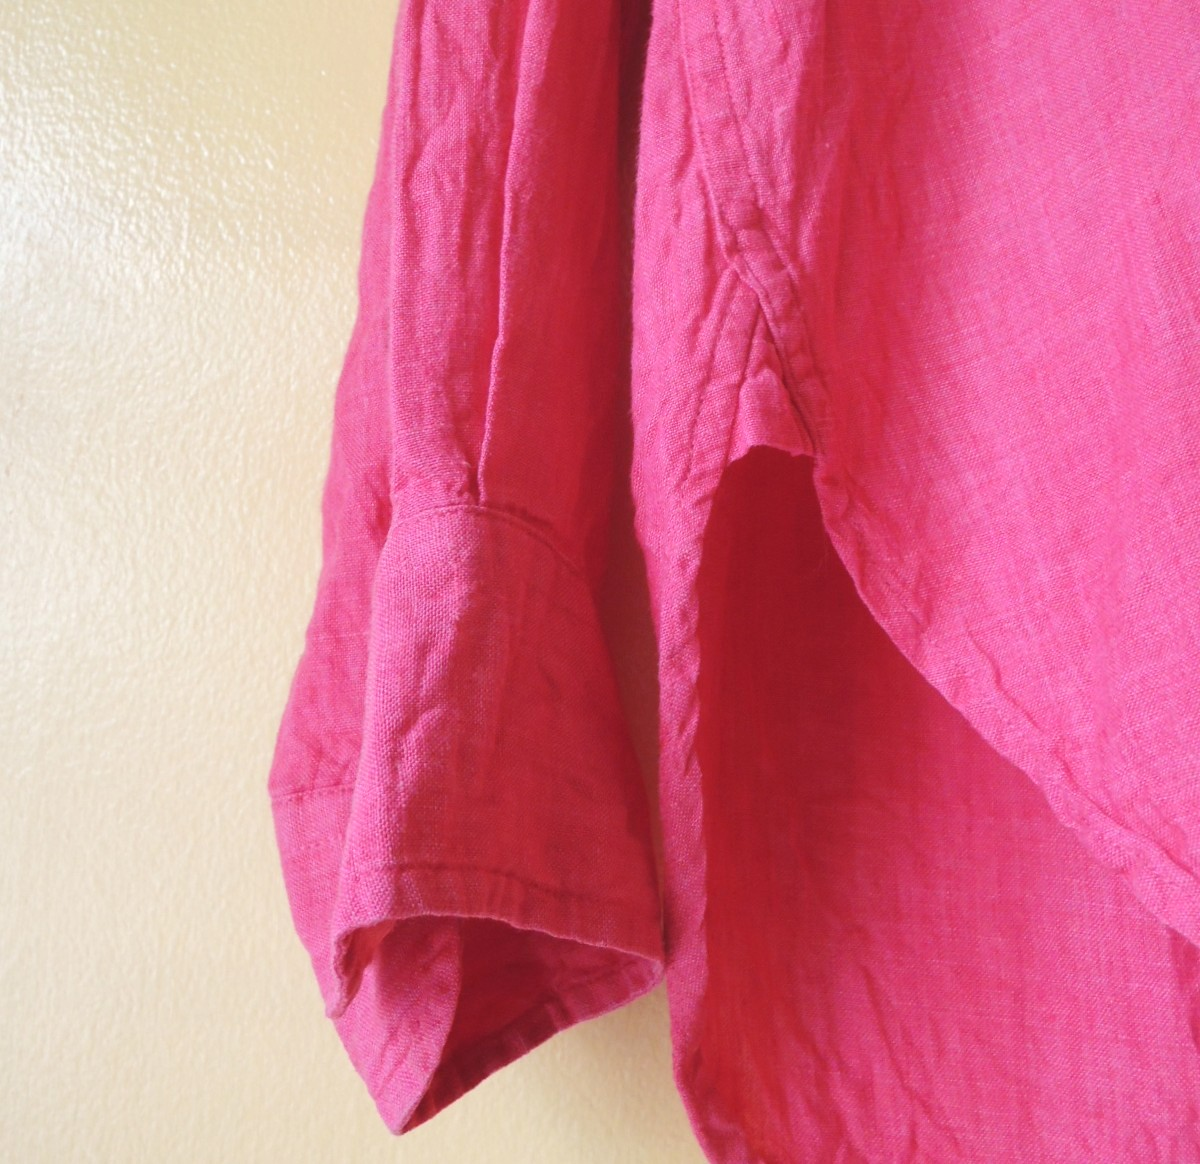 linenshirts05.JPG